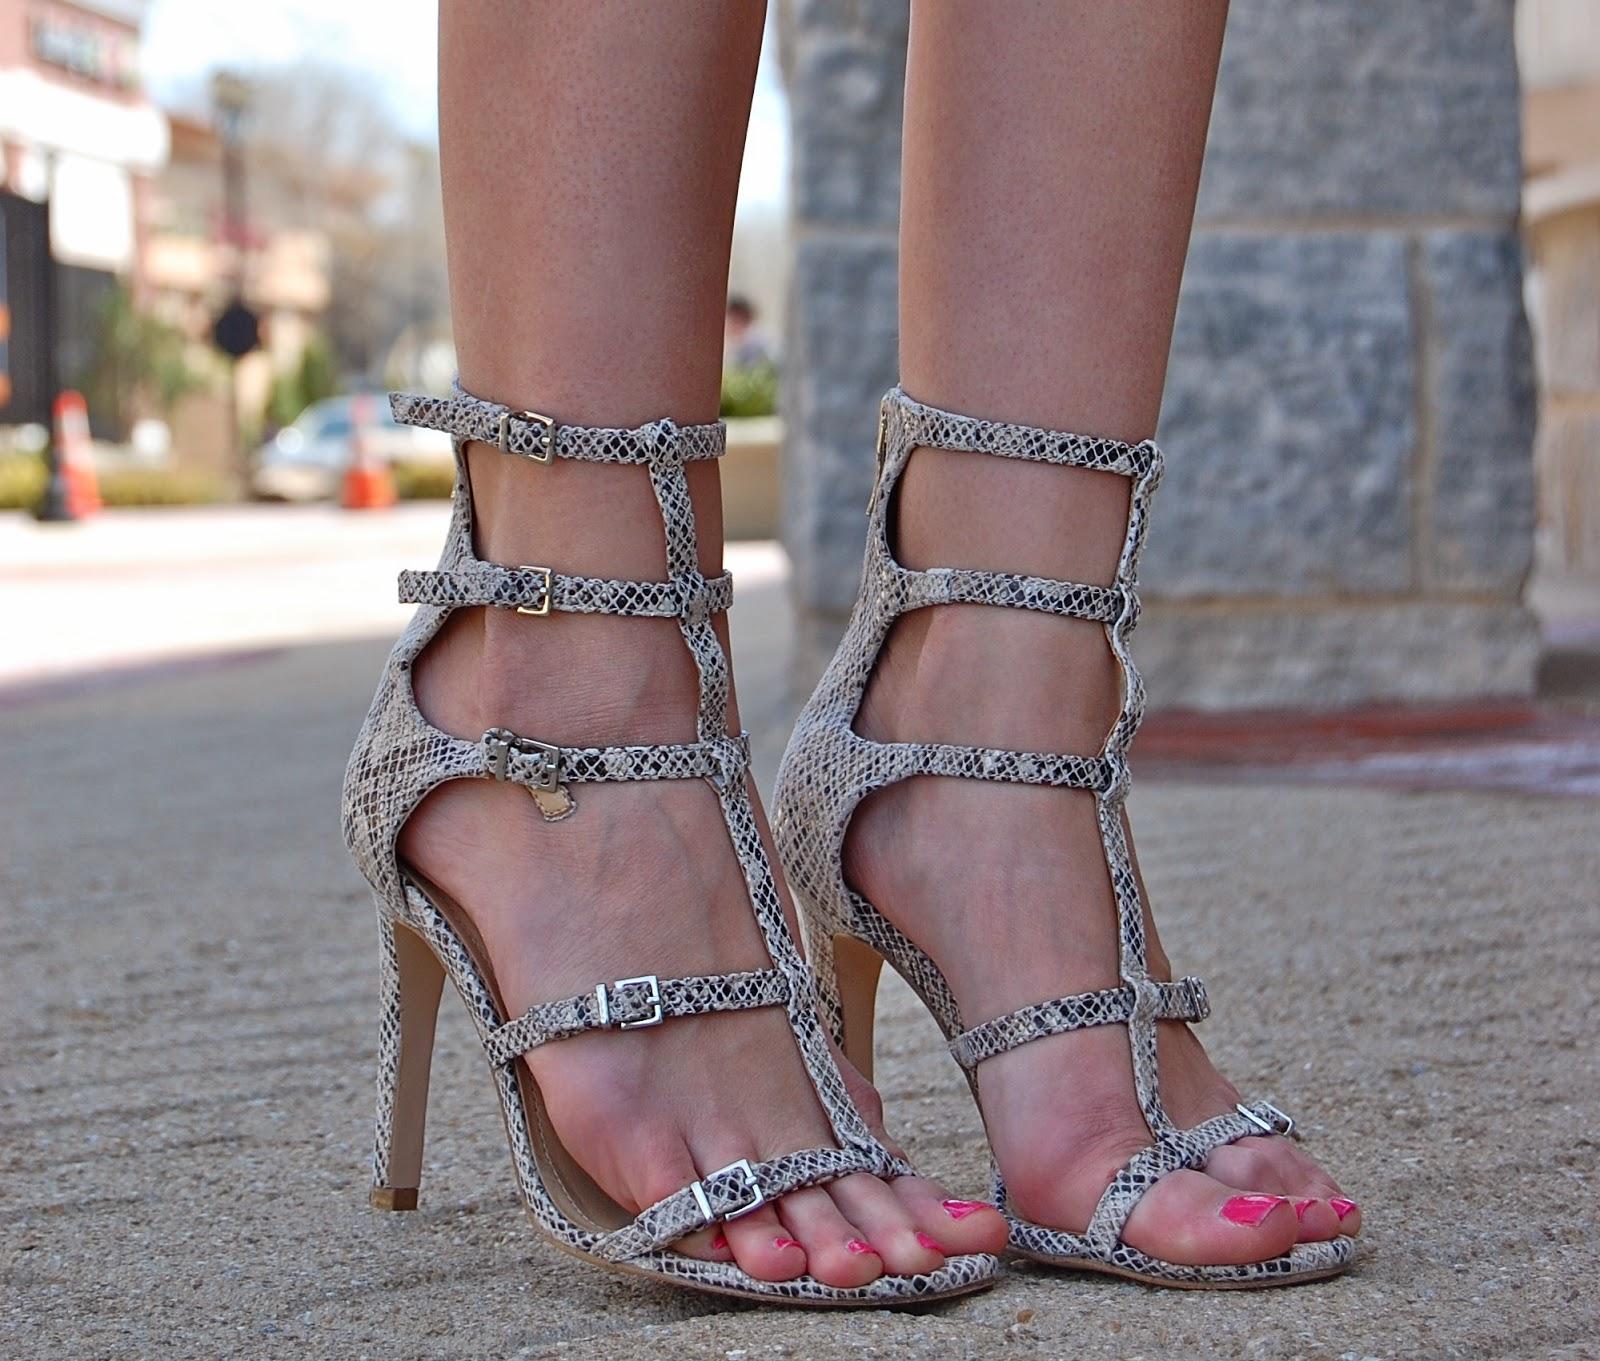 BCBGeneration Manci Sandal, Gladiator snakeskin sandal